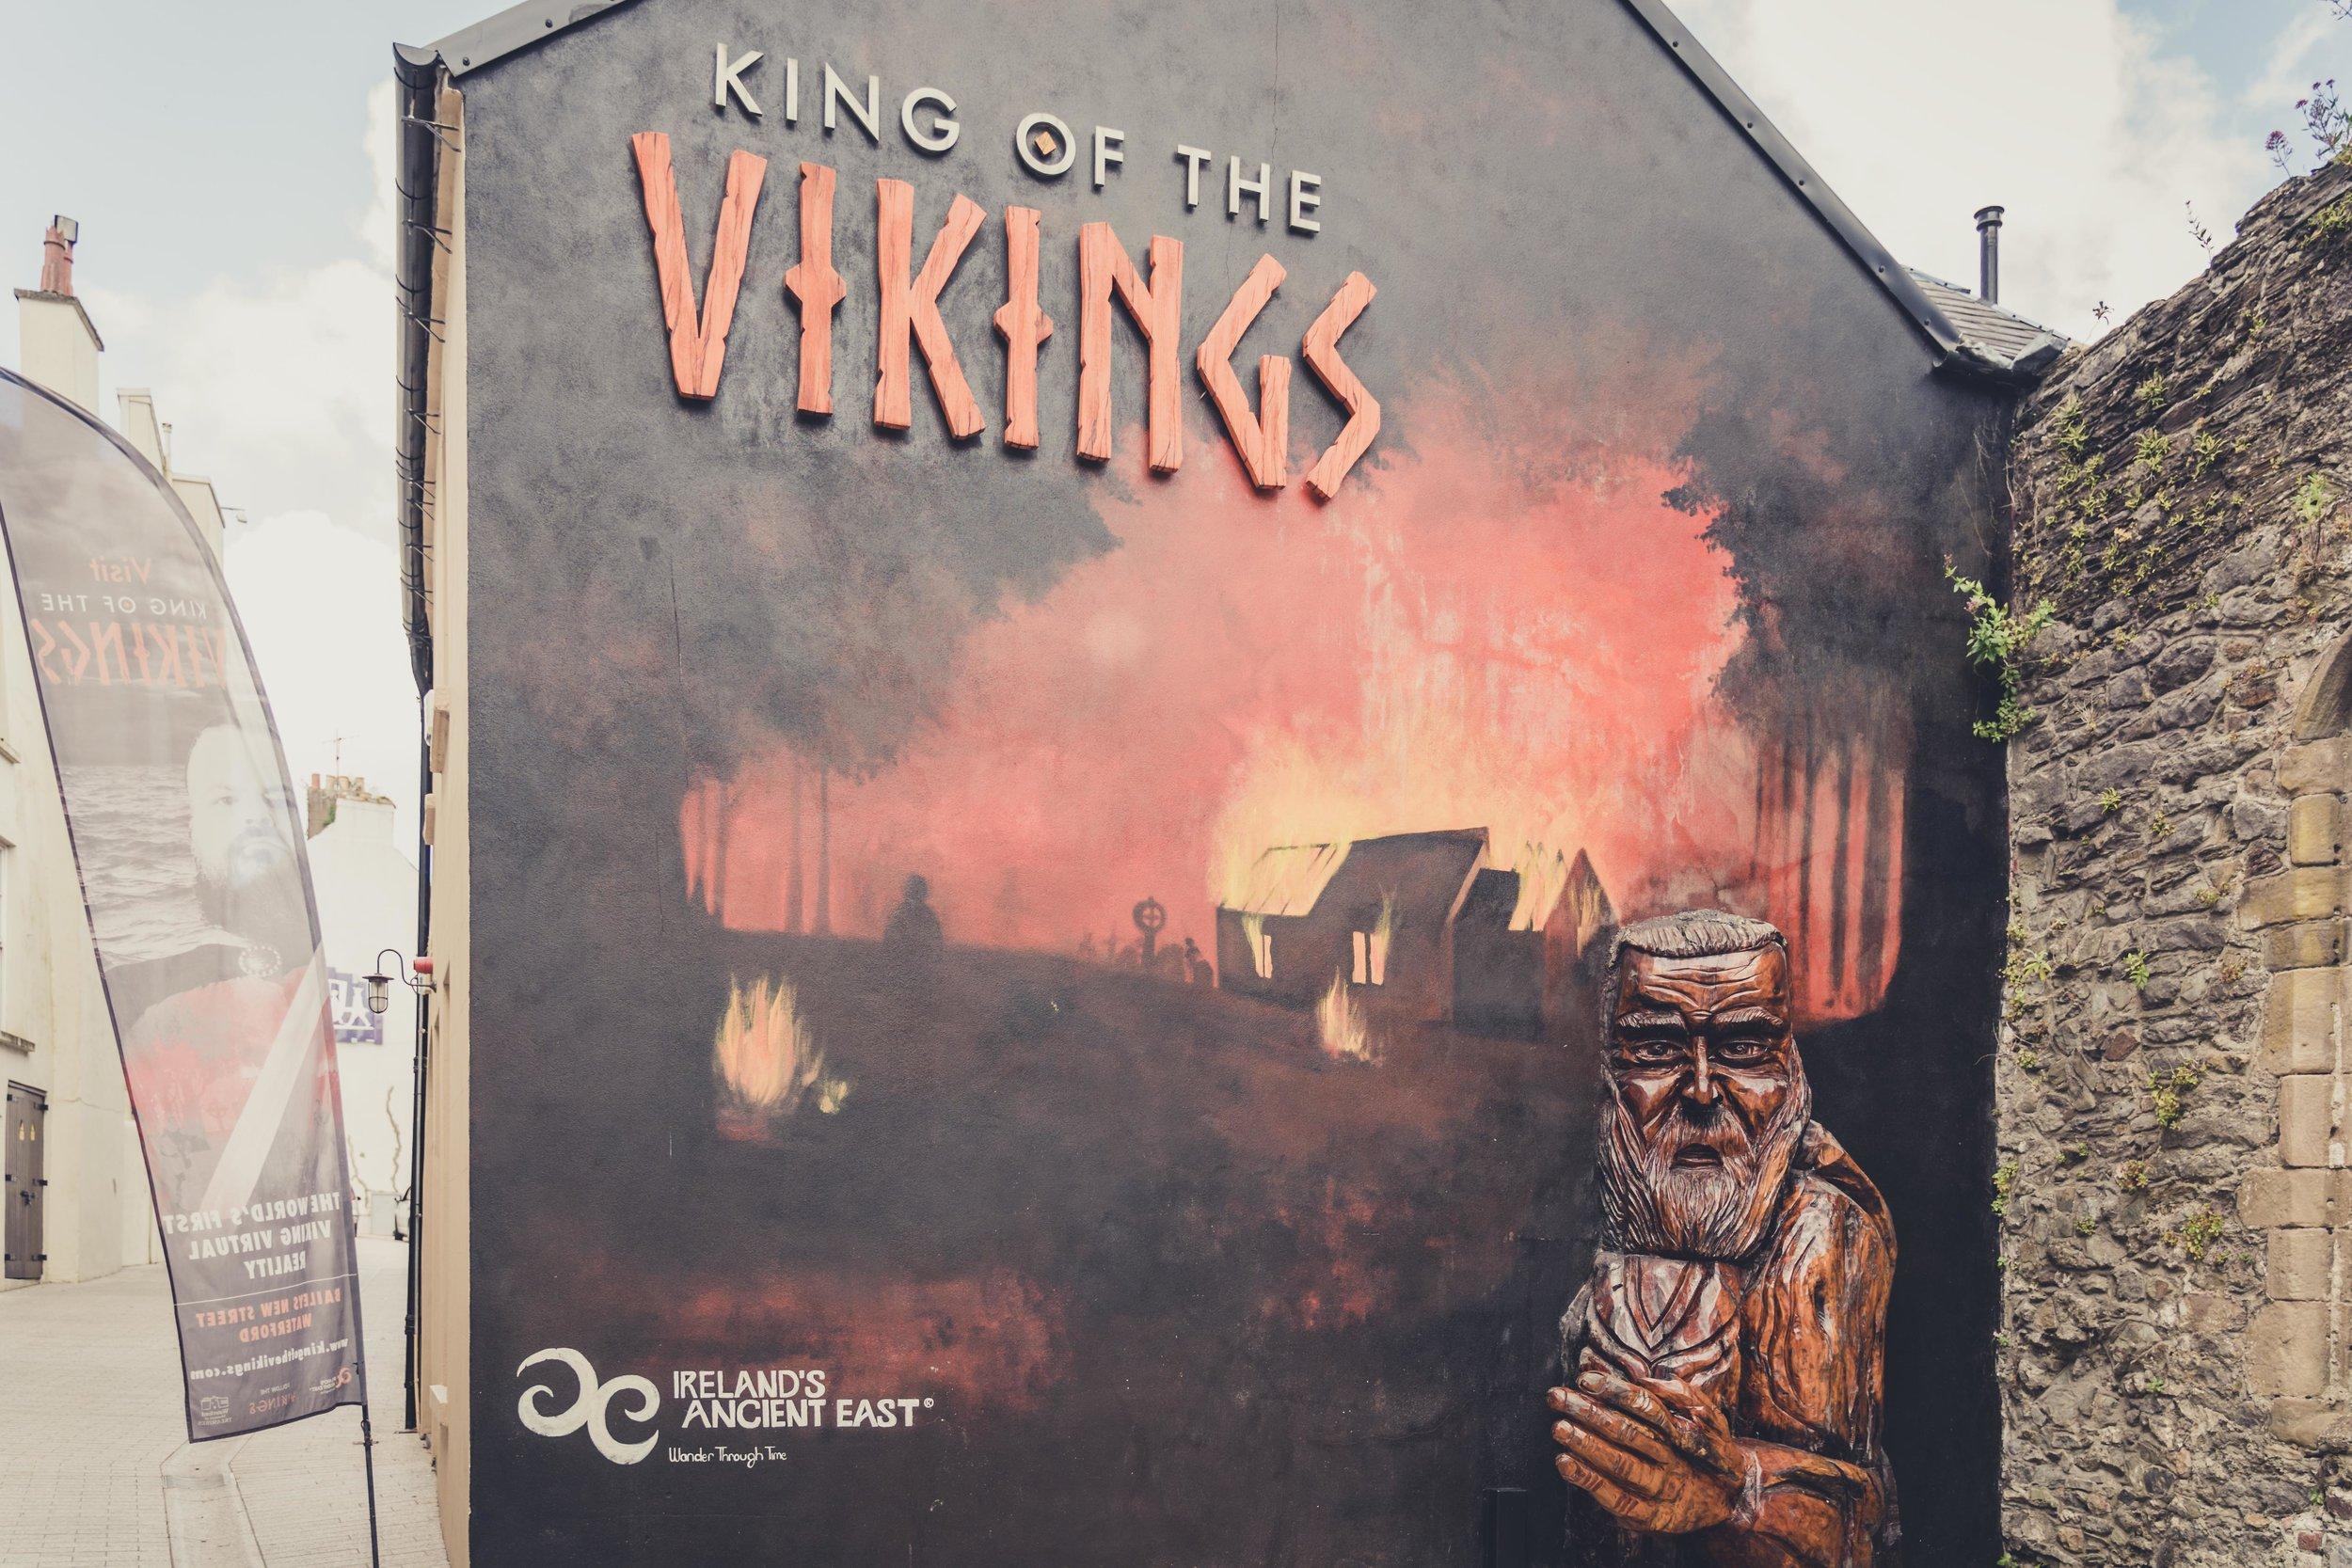 The viking kings waterford ireland VR  wall art.jpg